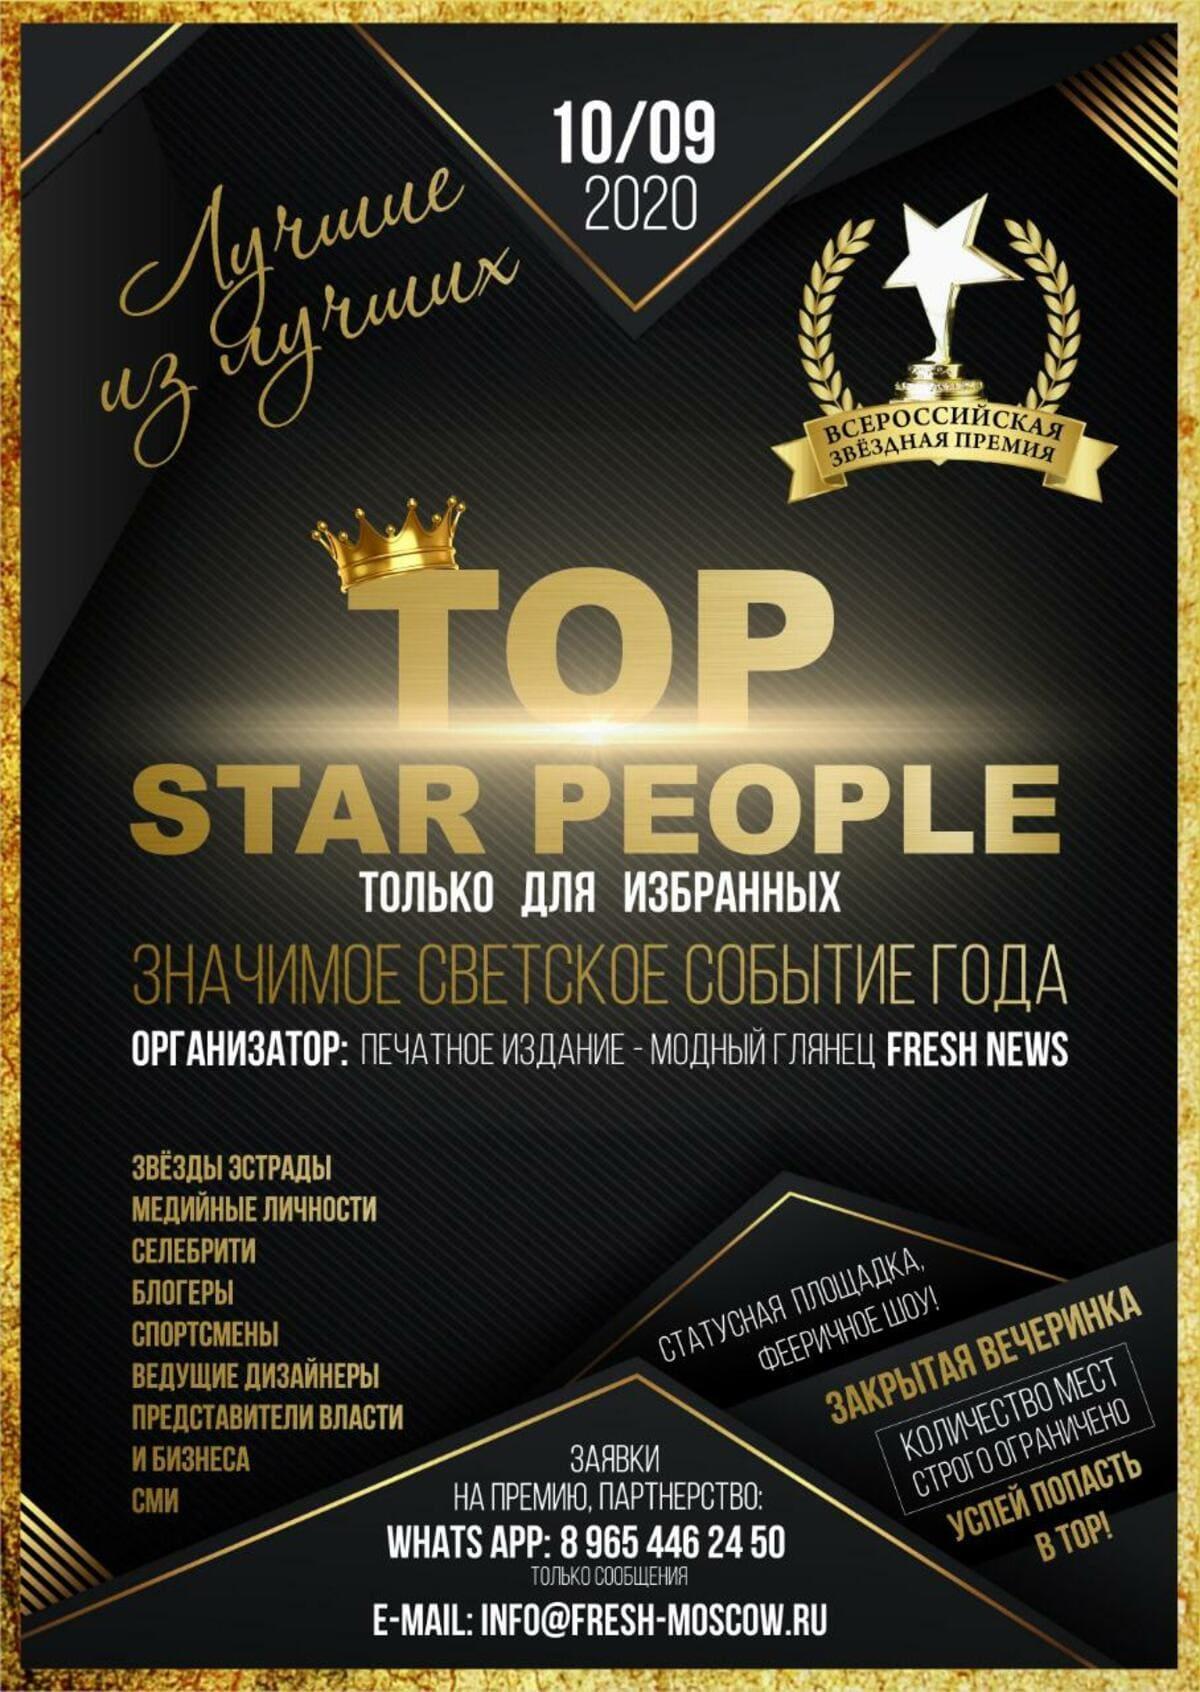 Top Star People 2020